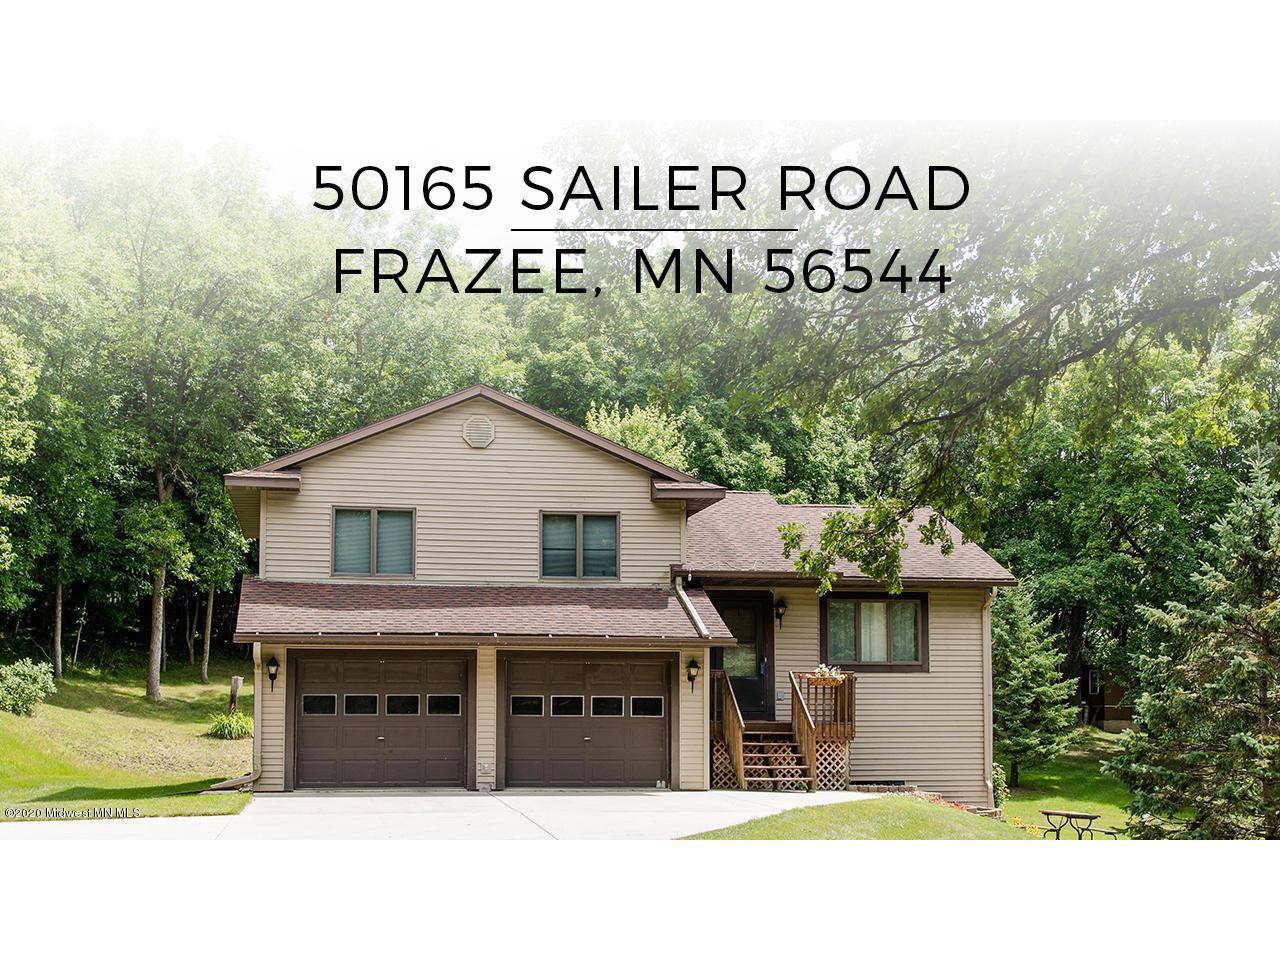 50165 Sailer Road Frazee Mn 56544 Mls 20 29519 Edina Realty